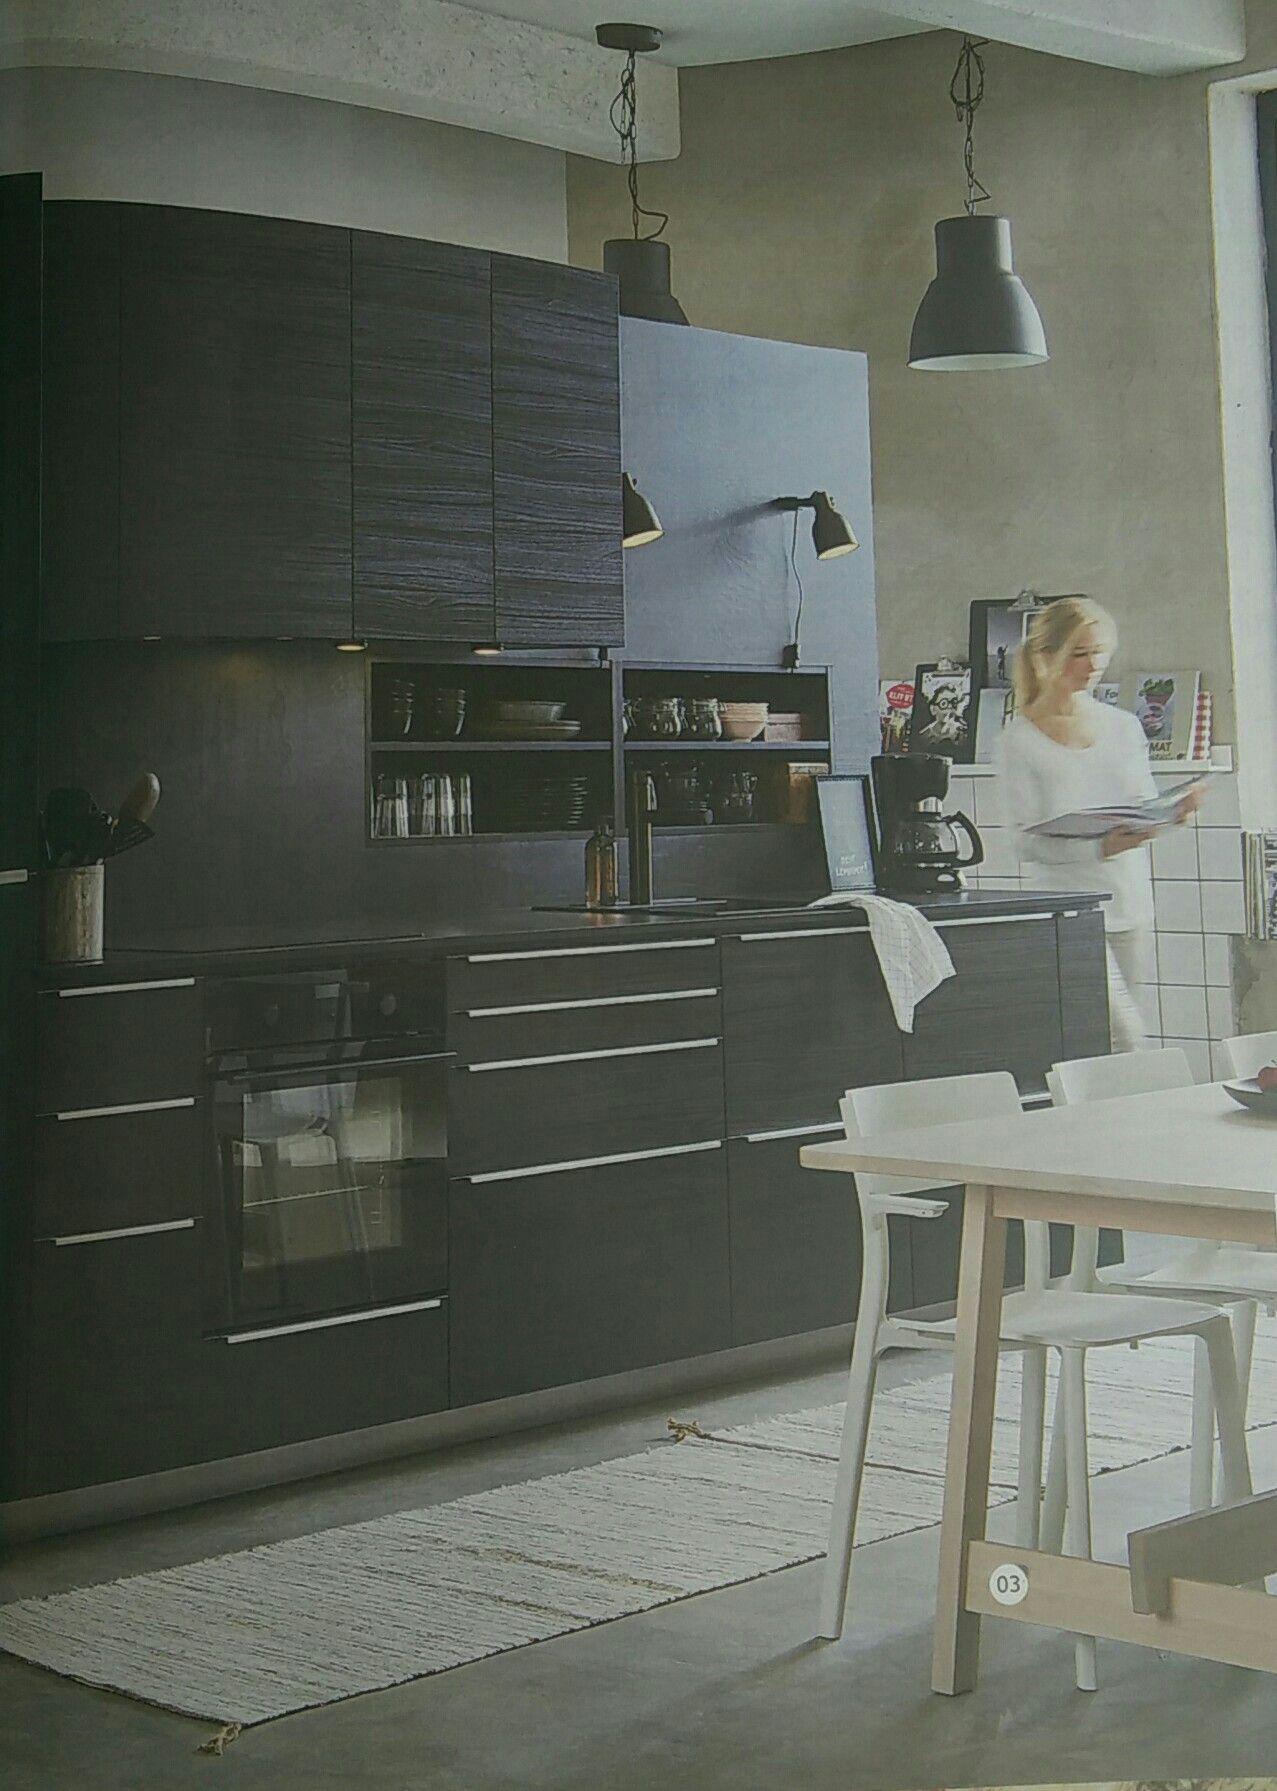 ikea metod/tingsryd kitchen  Ikea kitchen, Home kitchens, Ikea